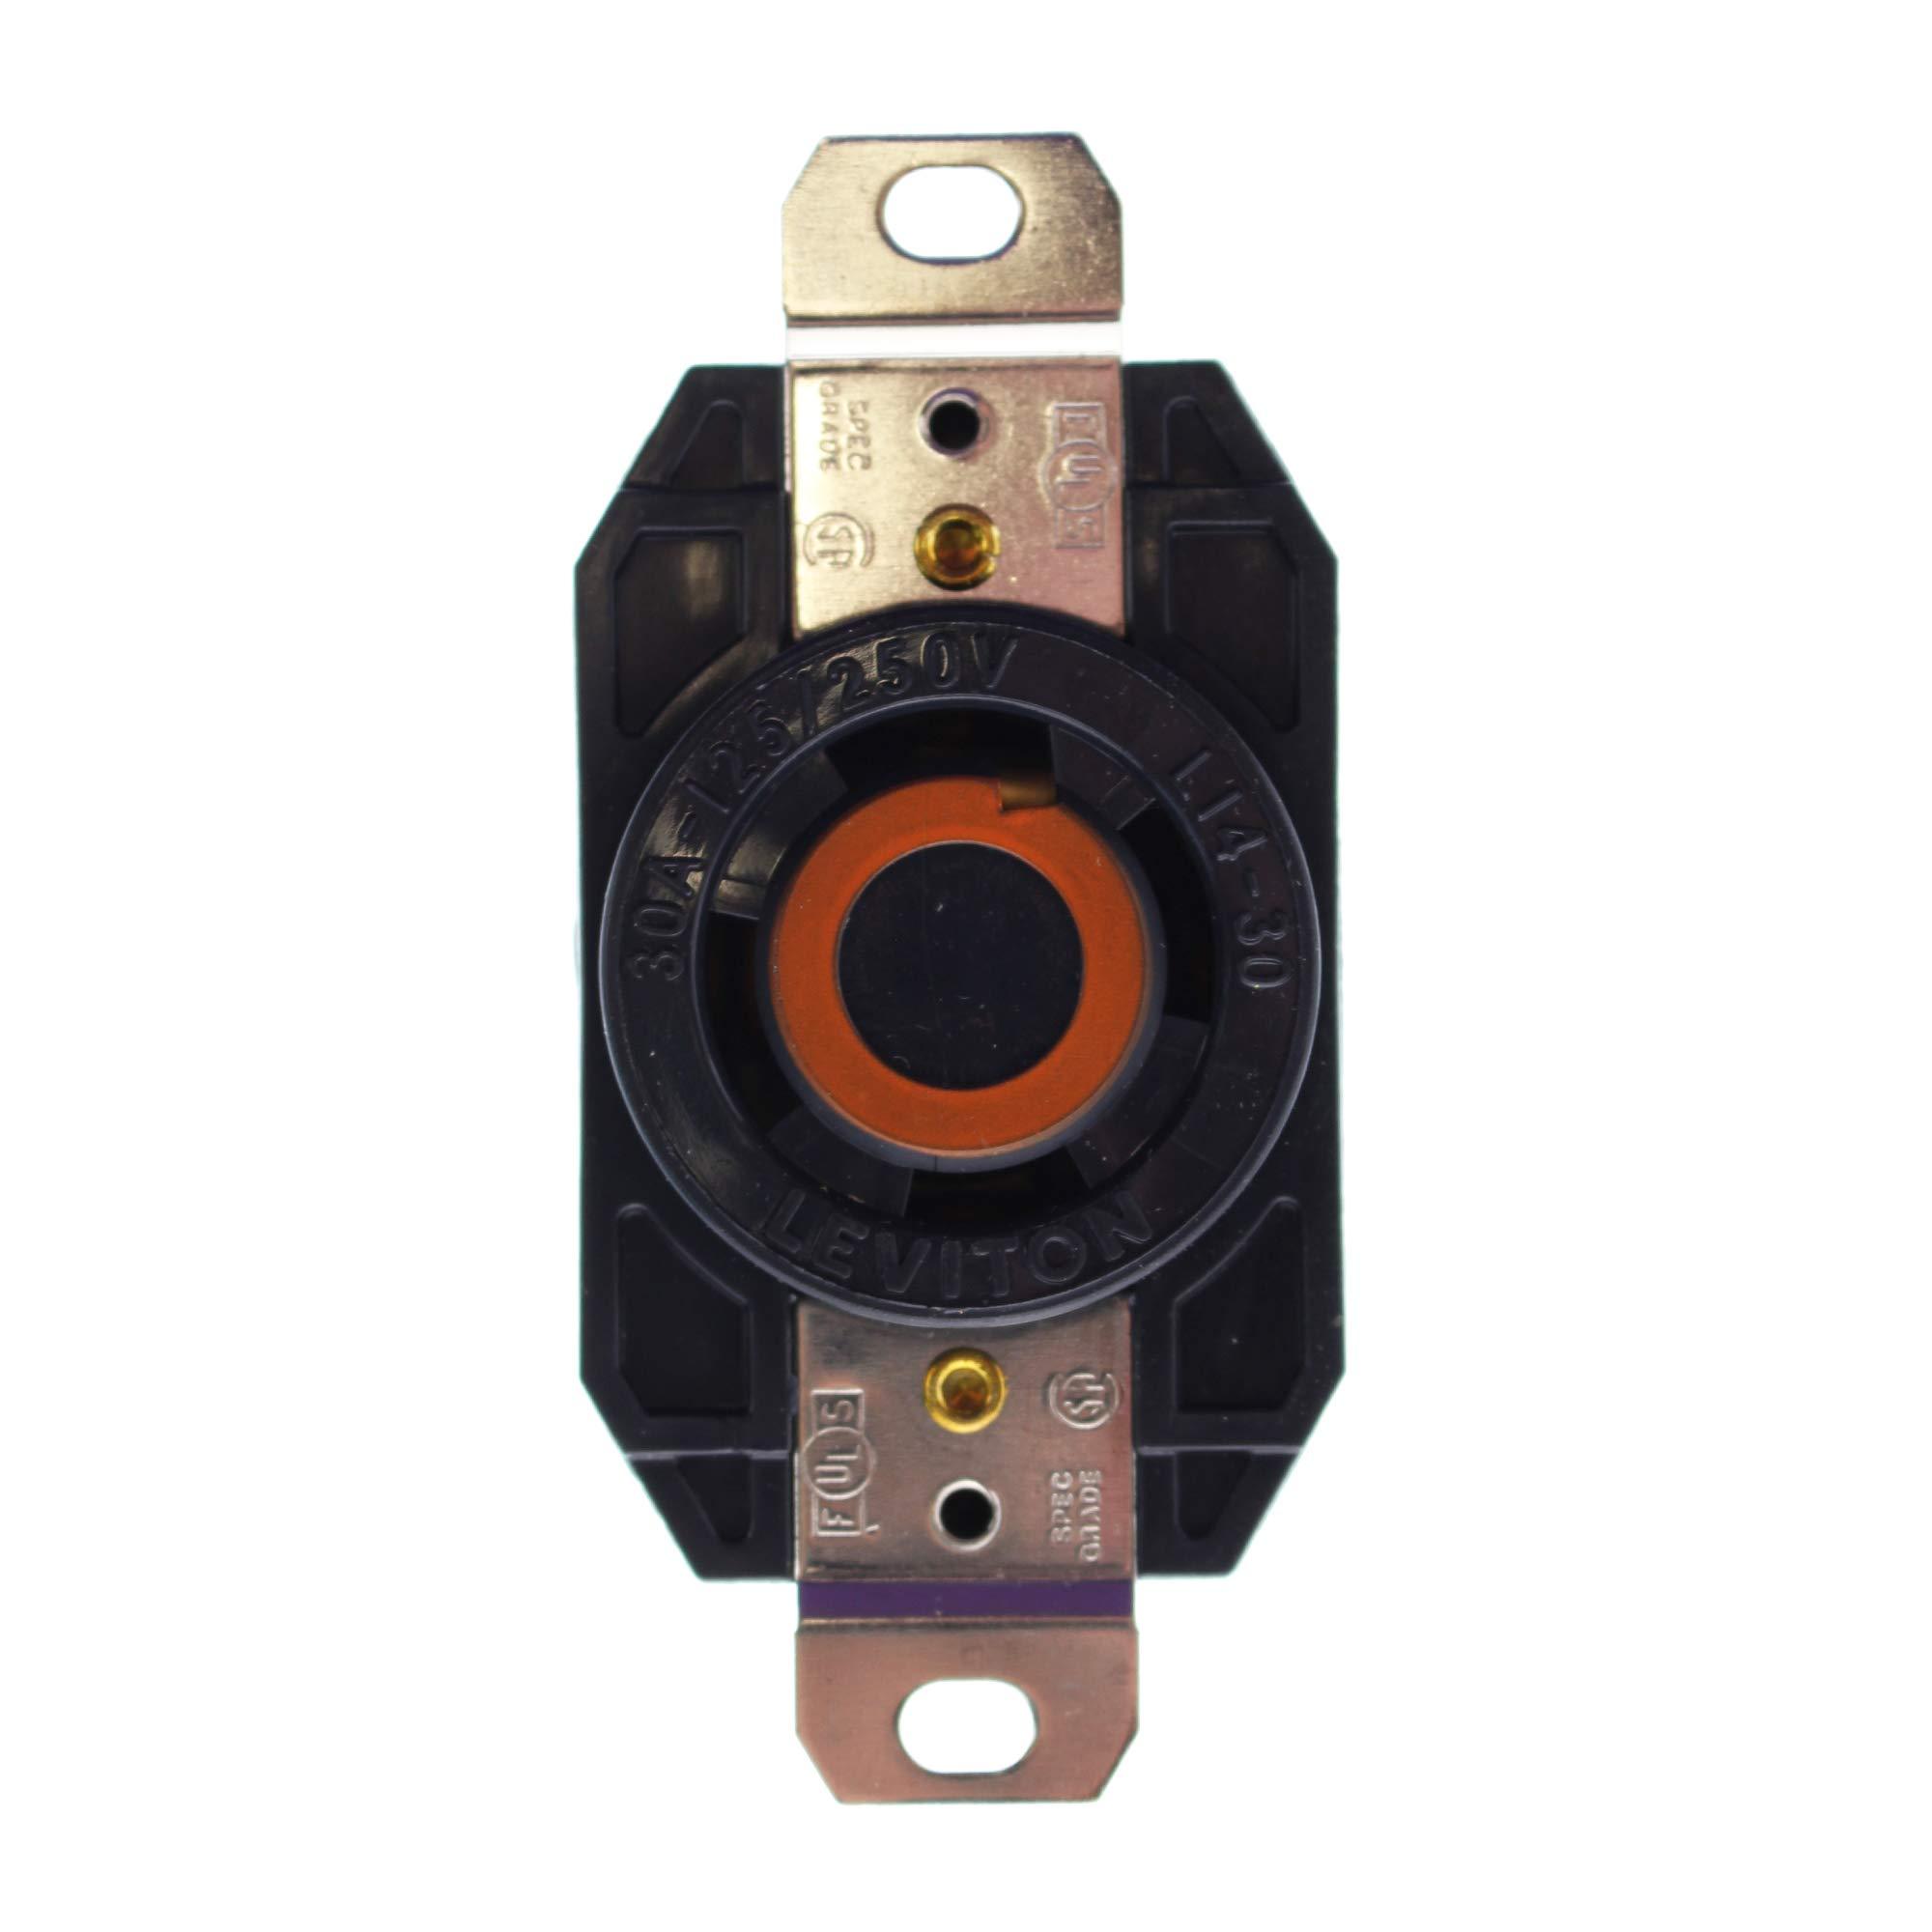 Leviton 2810 30 Amp, 120/208 Volt- 3PY, Flush Mounting Locking Receptacle, Industrial Grade, Grounding, V-0-Max, Black